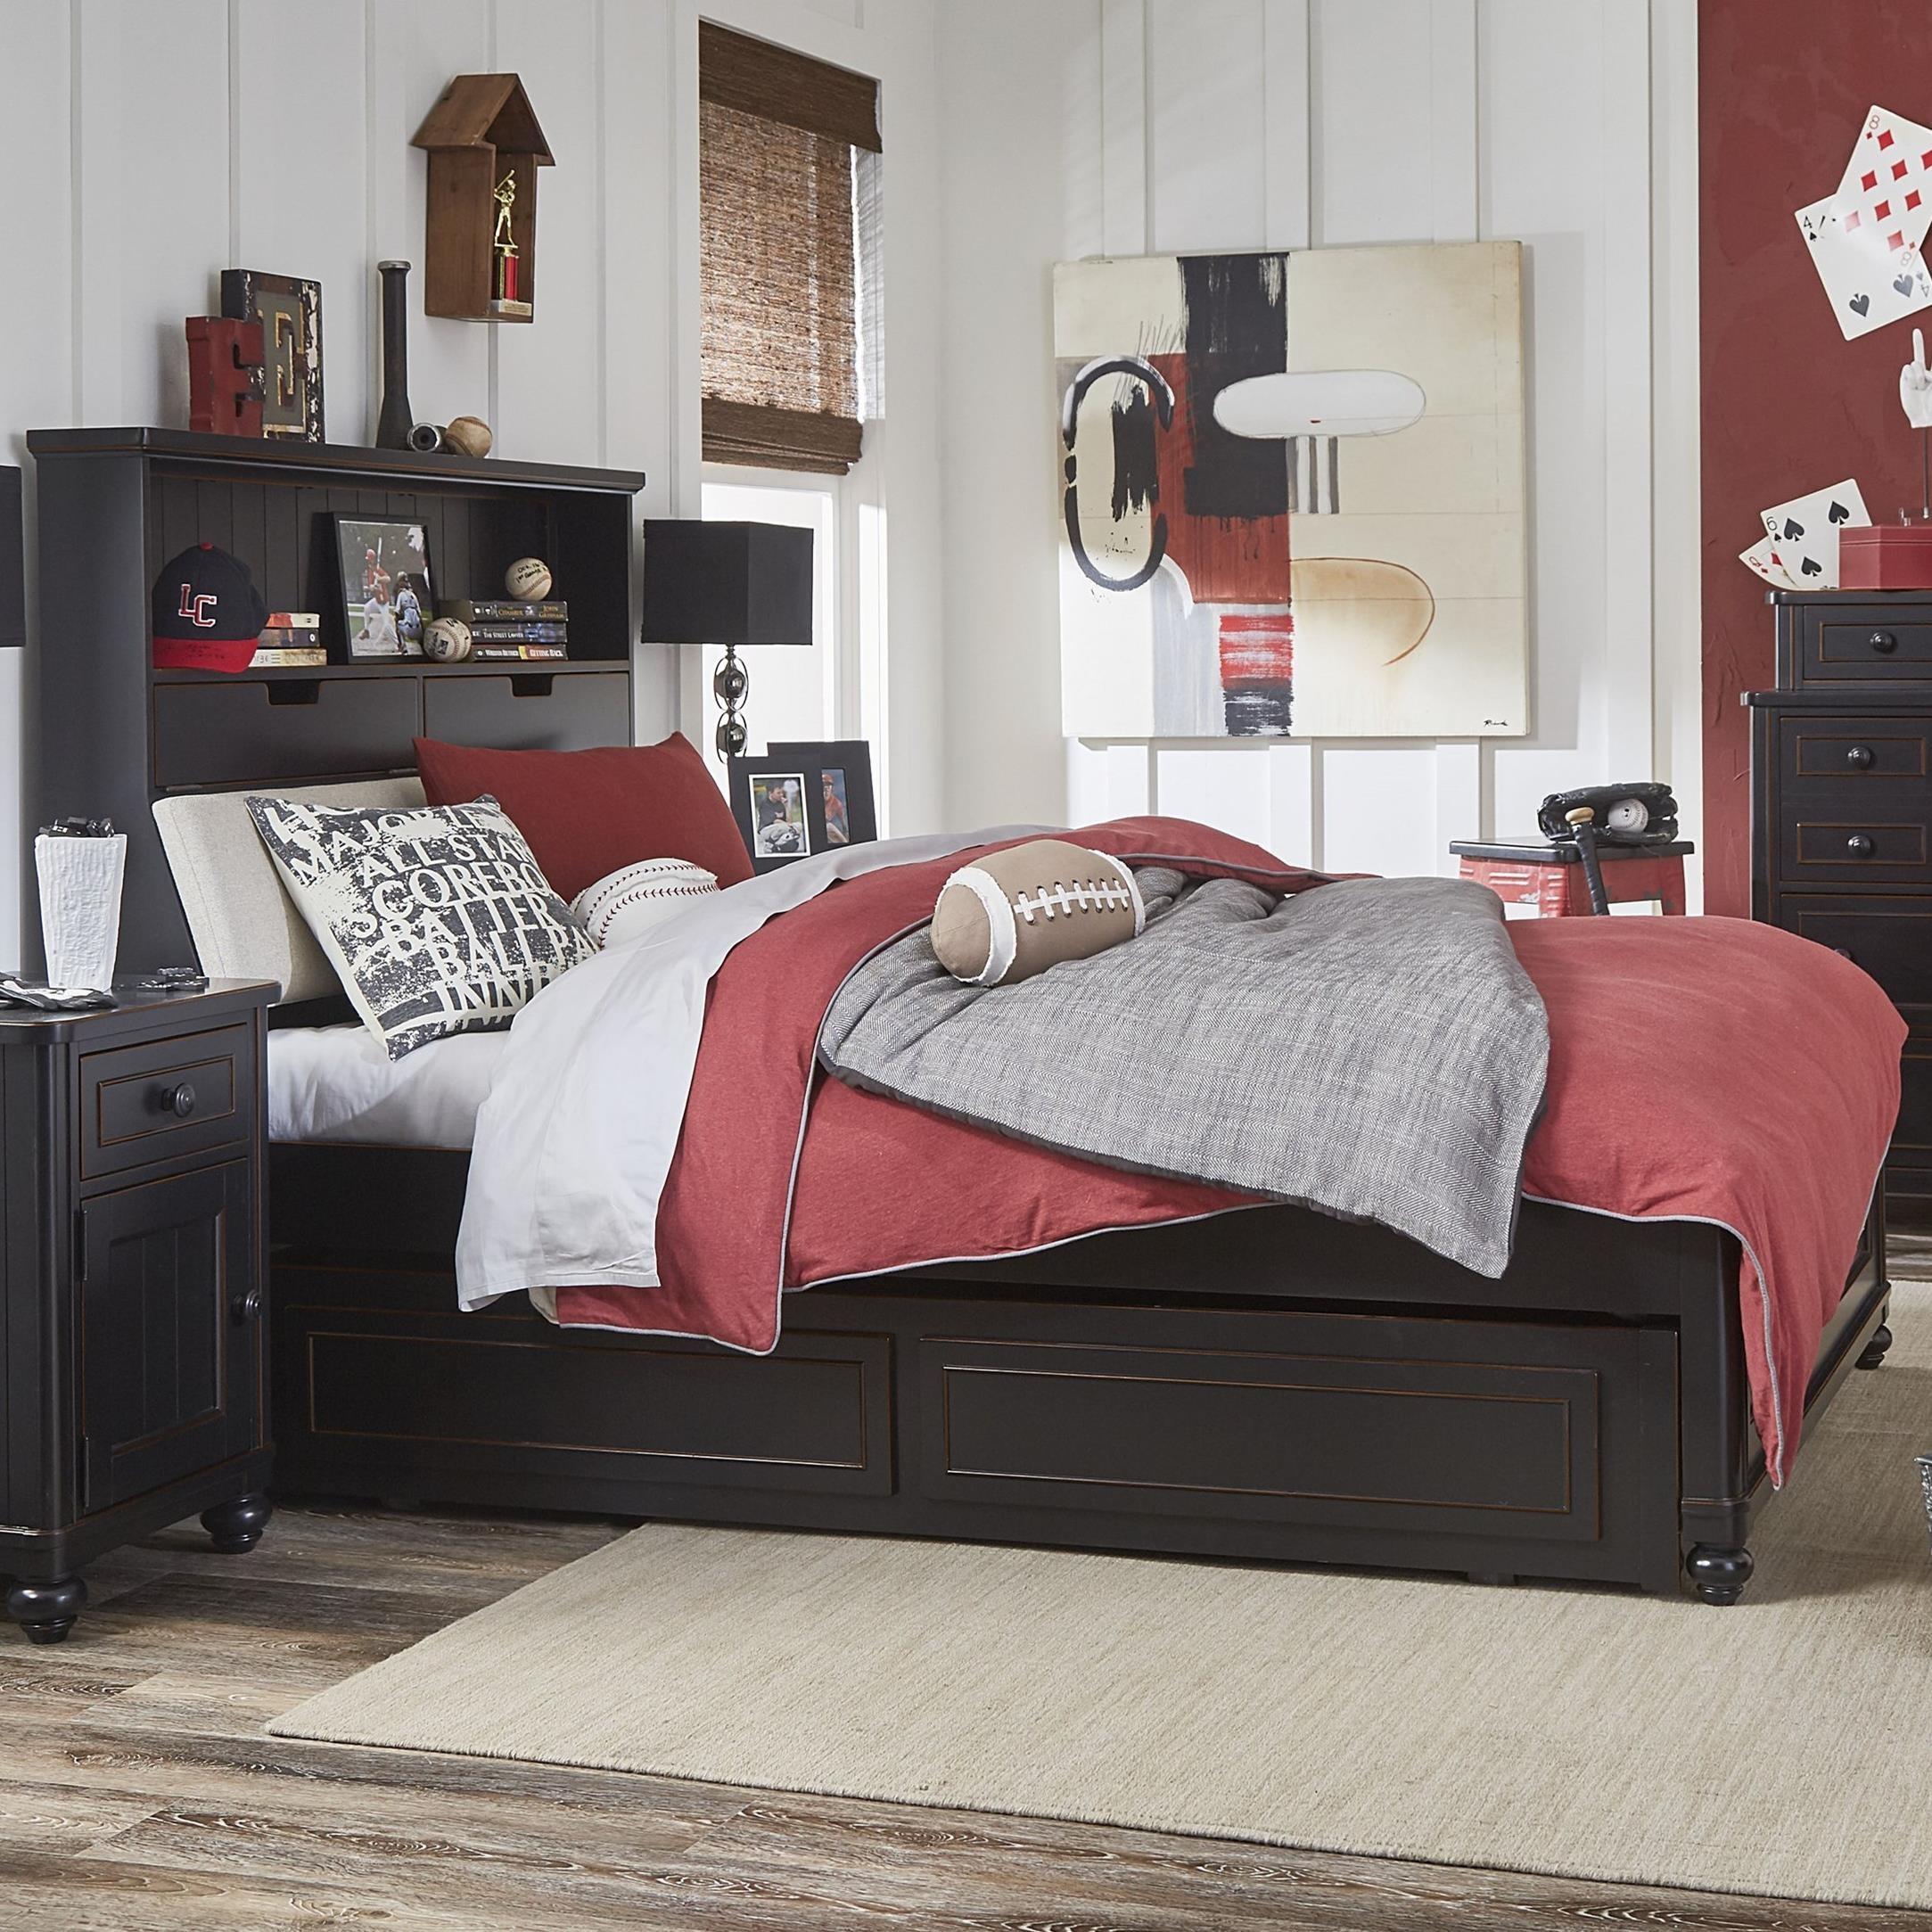 Full Upholstered Bookcase Bed